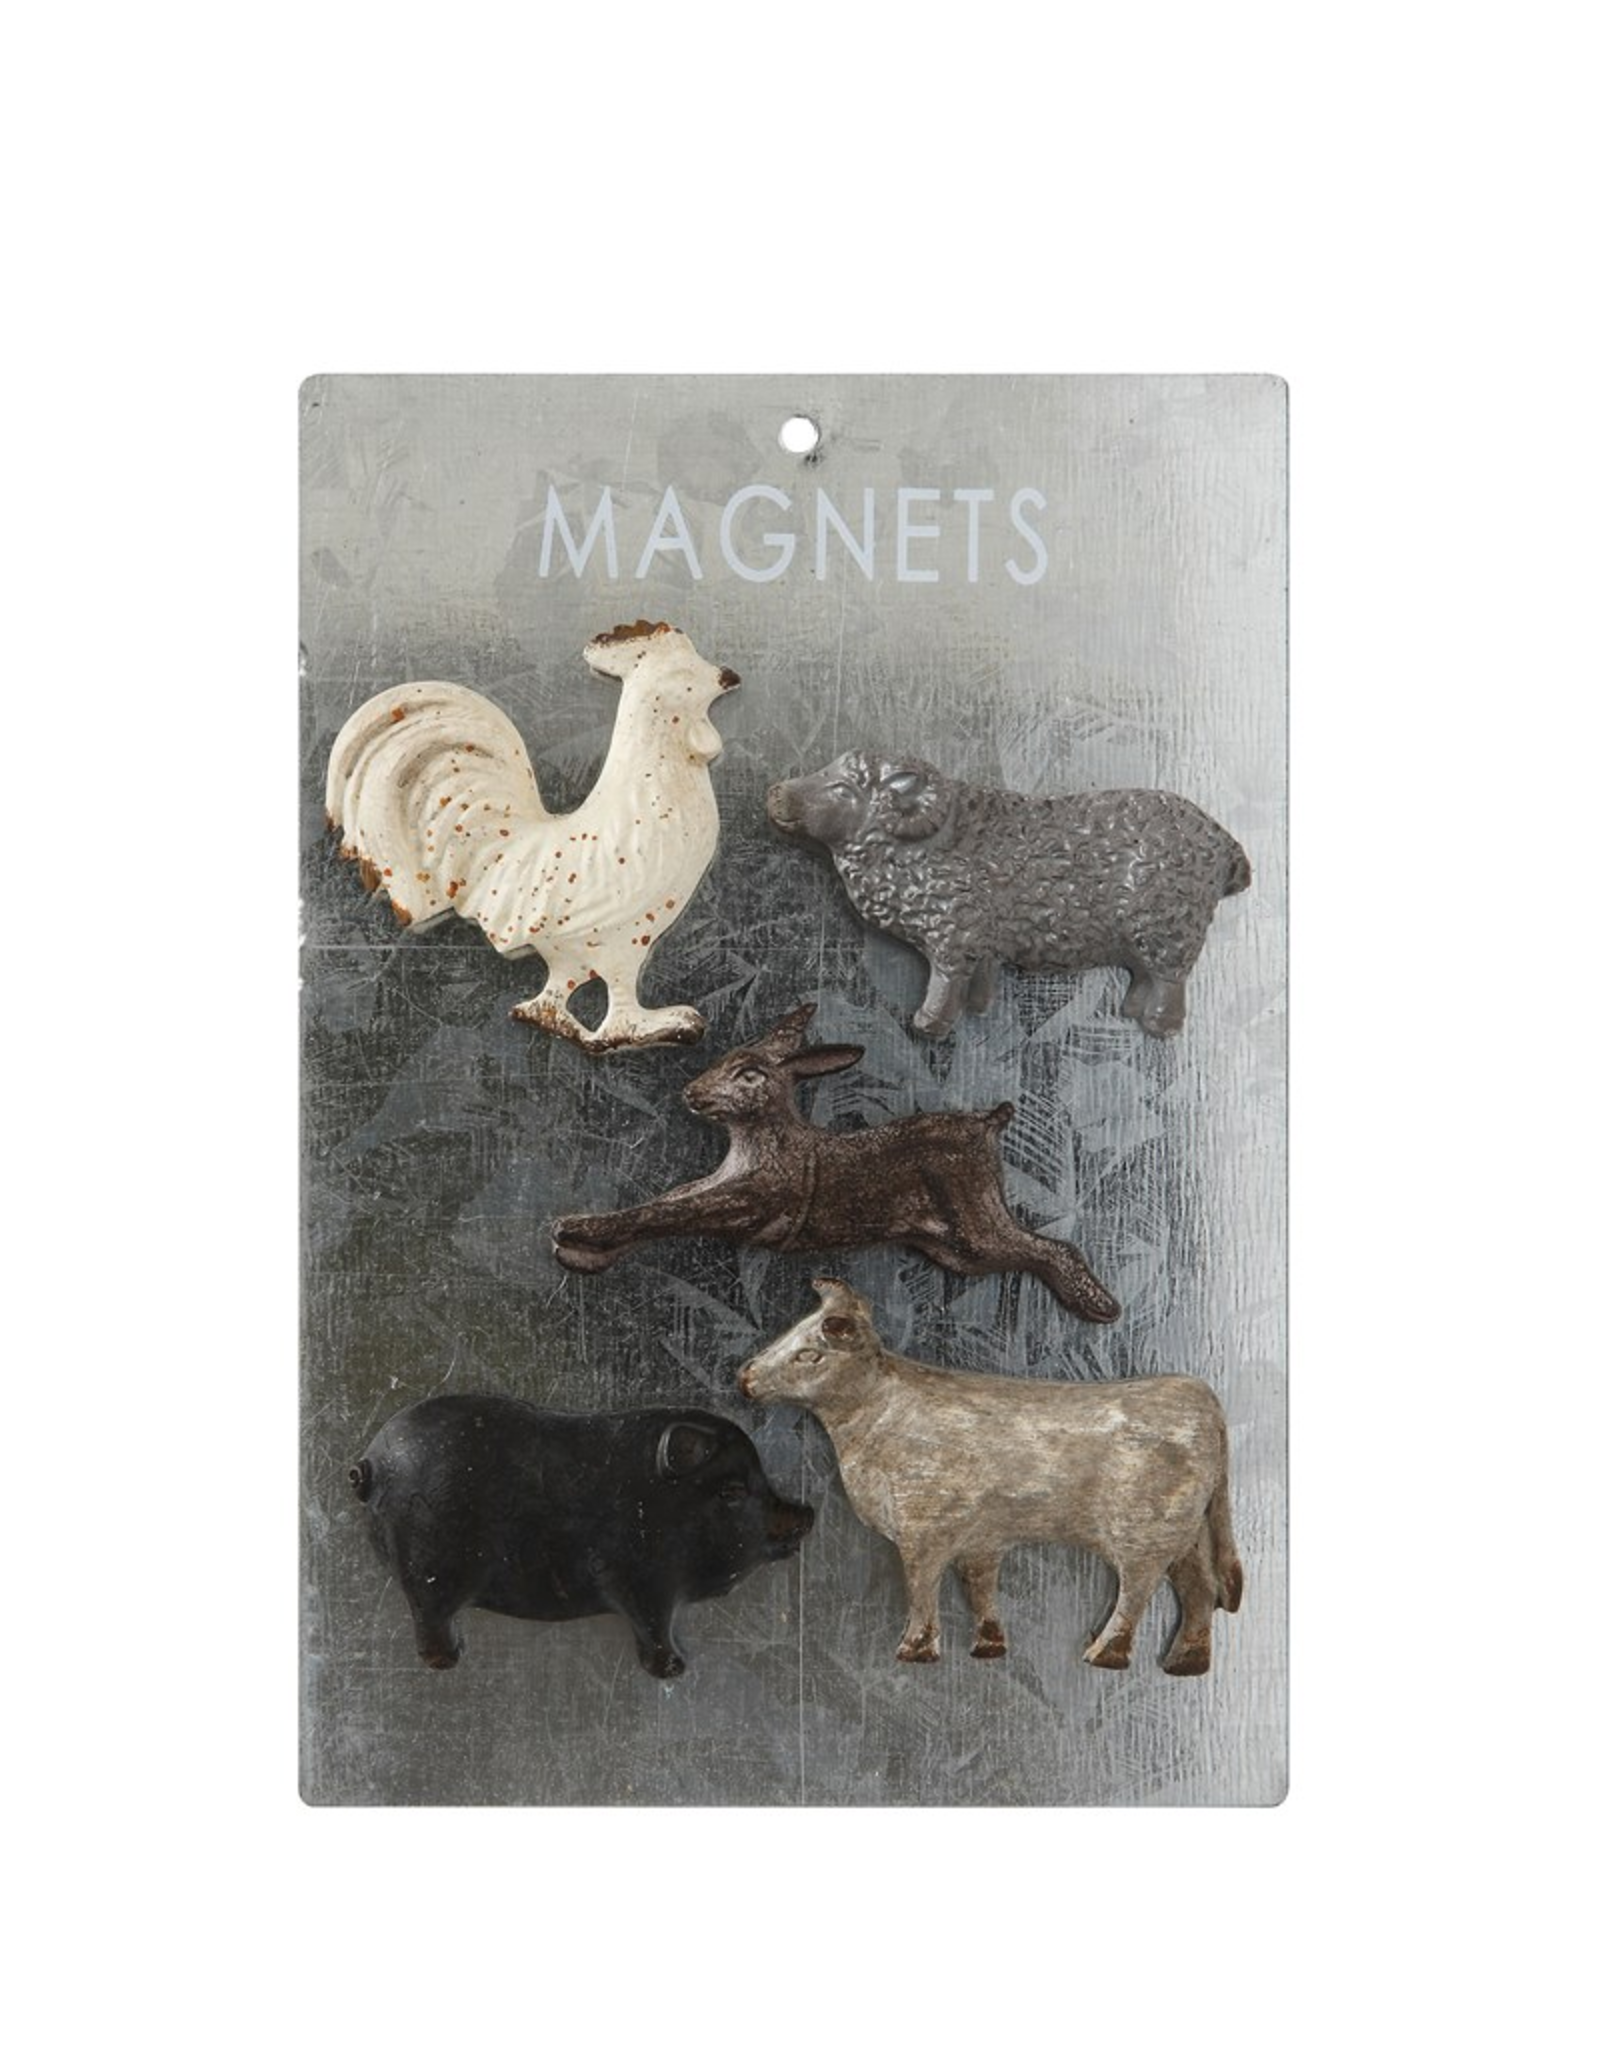 MAGNET SET-FARM ANIMALS, PEWTER, 5PC